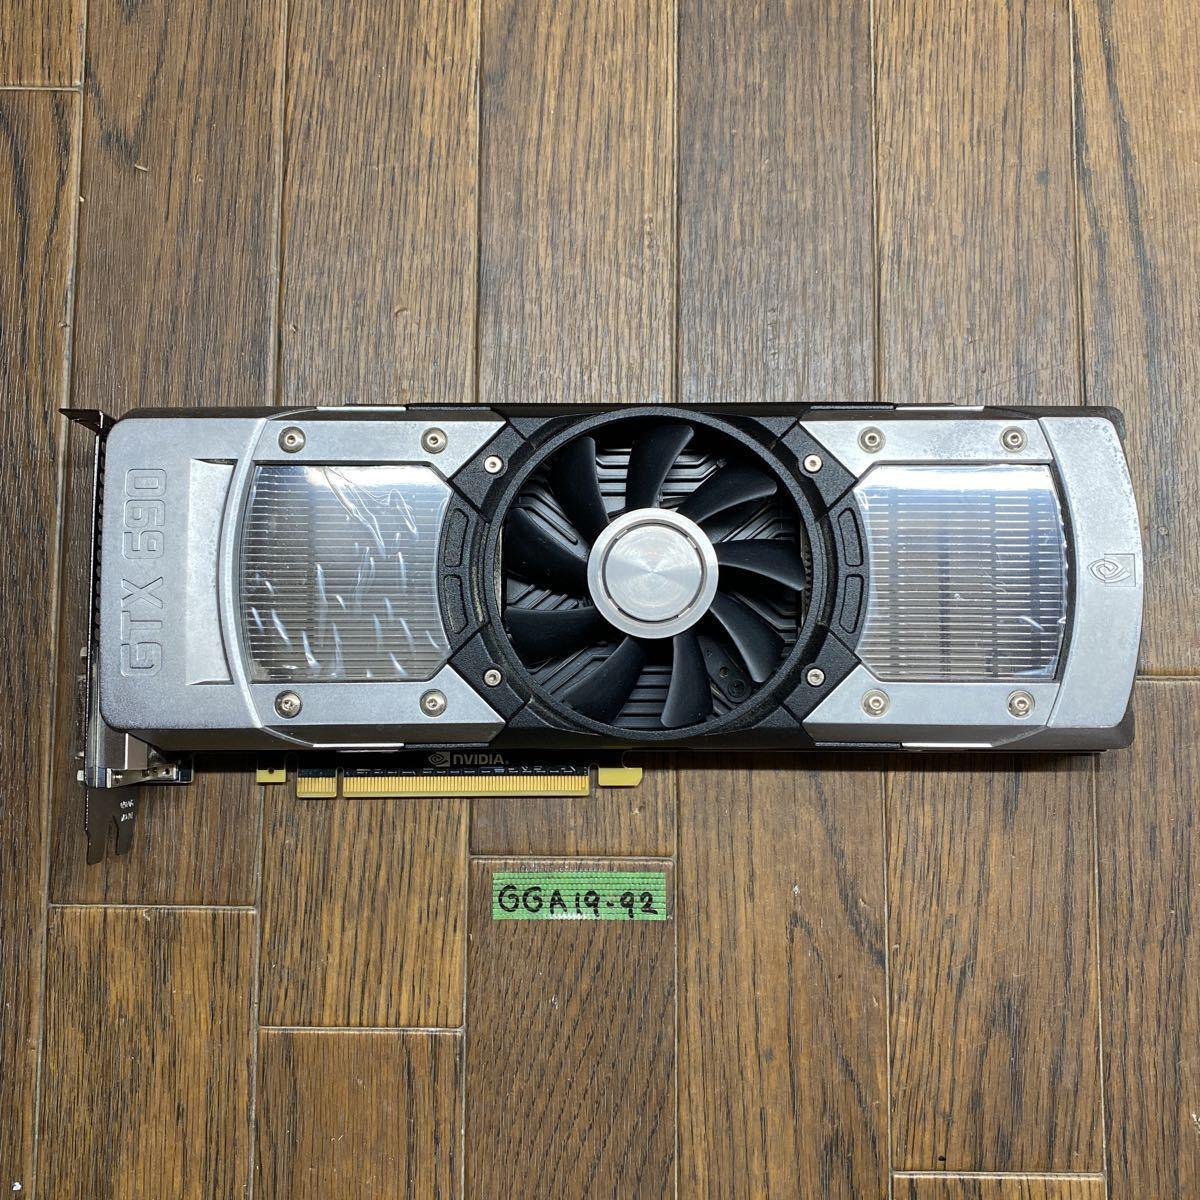 GGA19-92 激安 グラフィックボード ASUS NVIDIA GeForce GTX 690 GDDR5 4GB GTX690-4GD5 認識.画像出力のみ確認 中古品 同梱可能